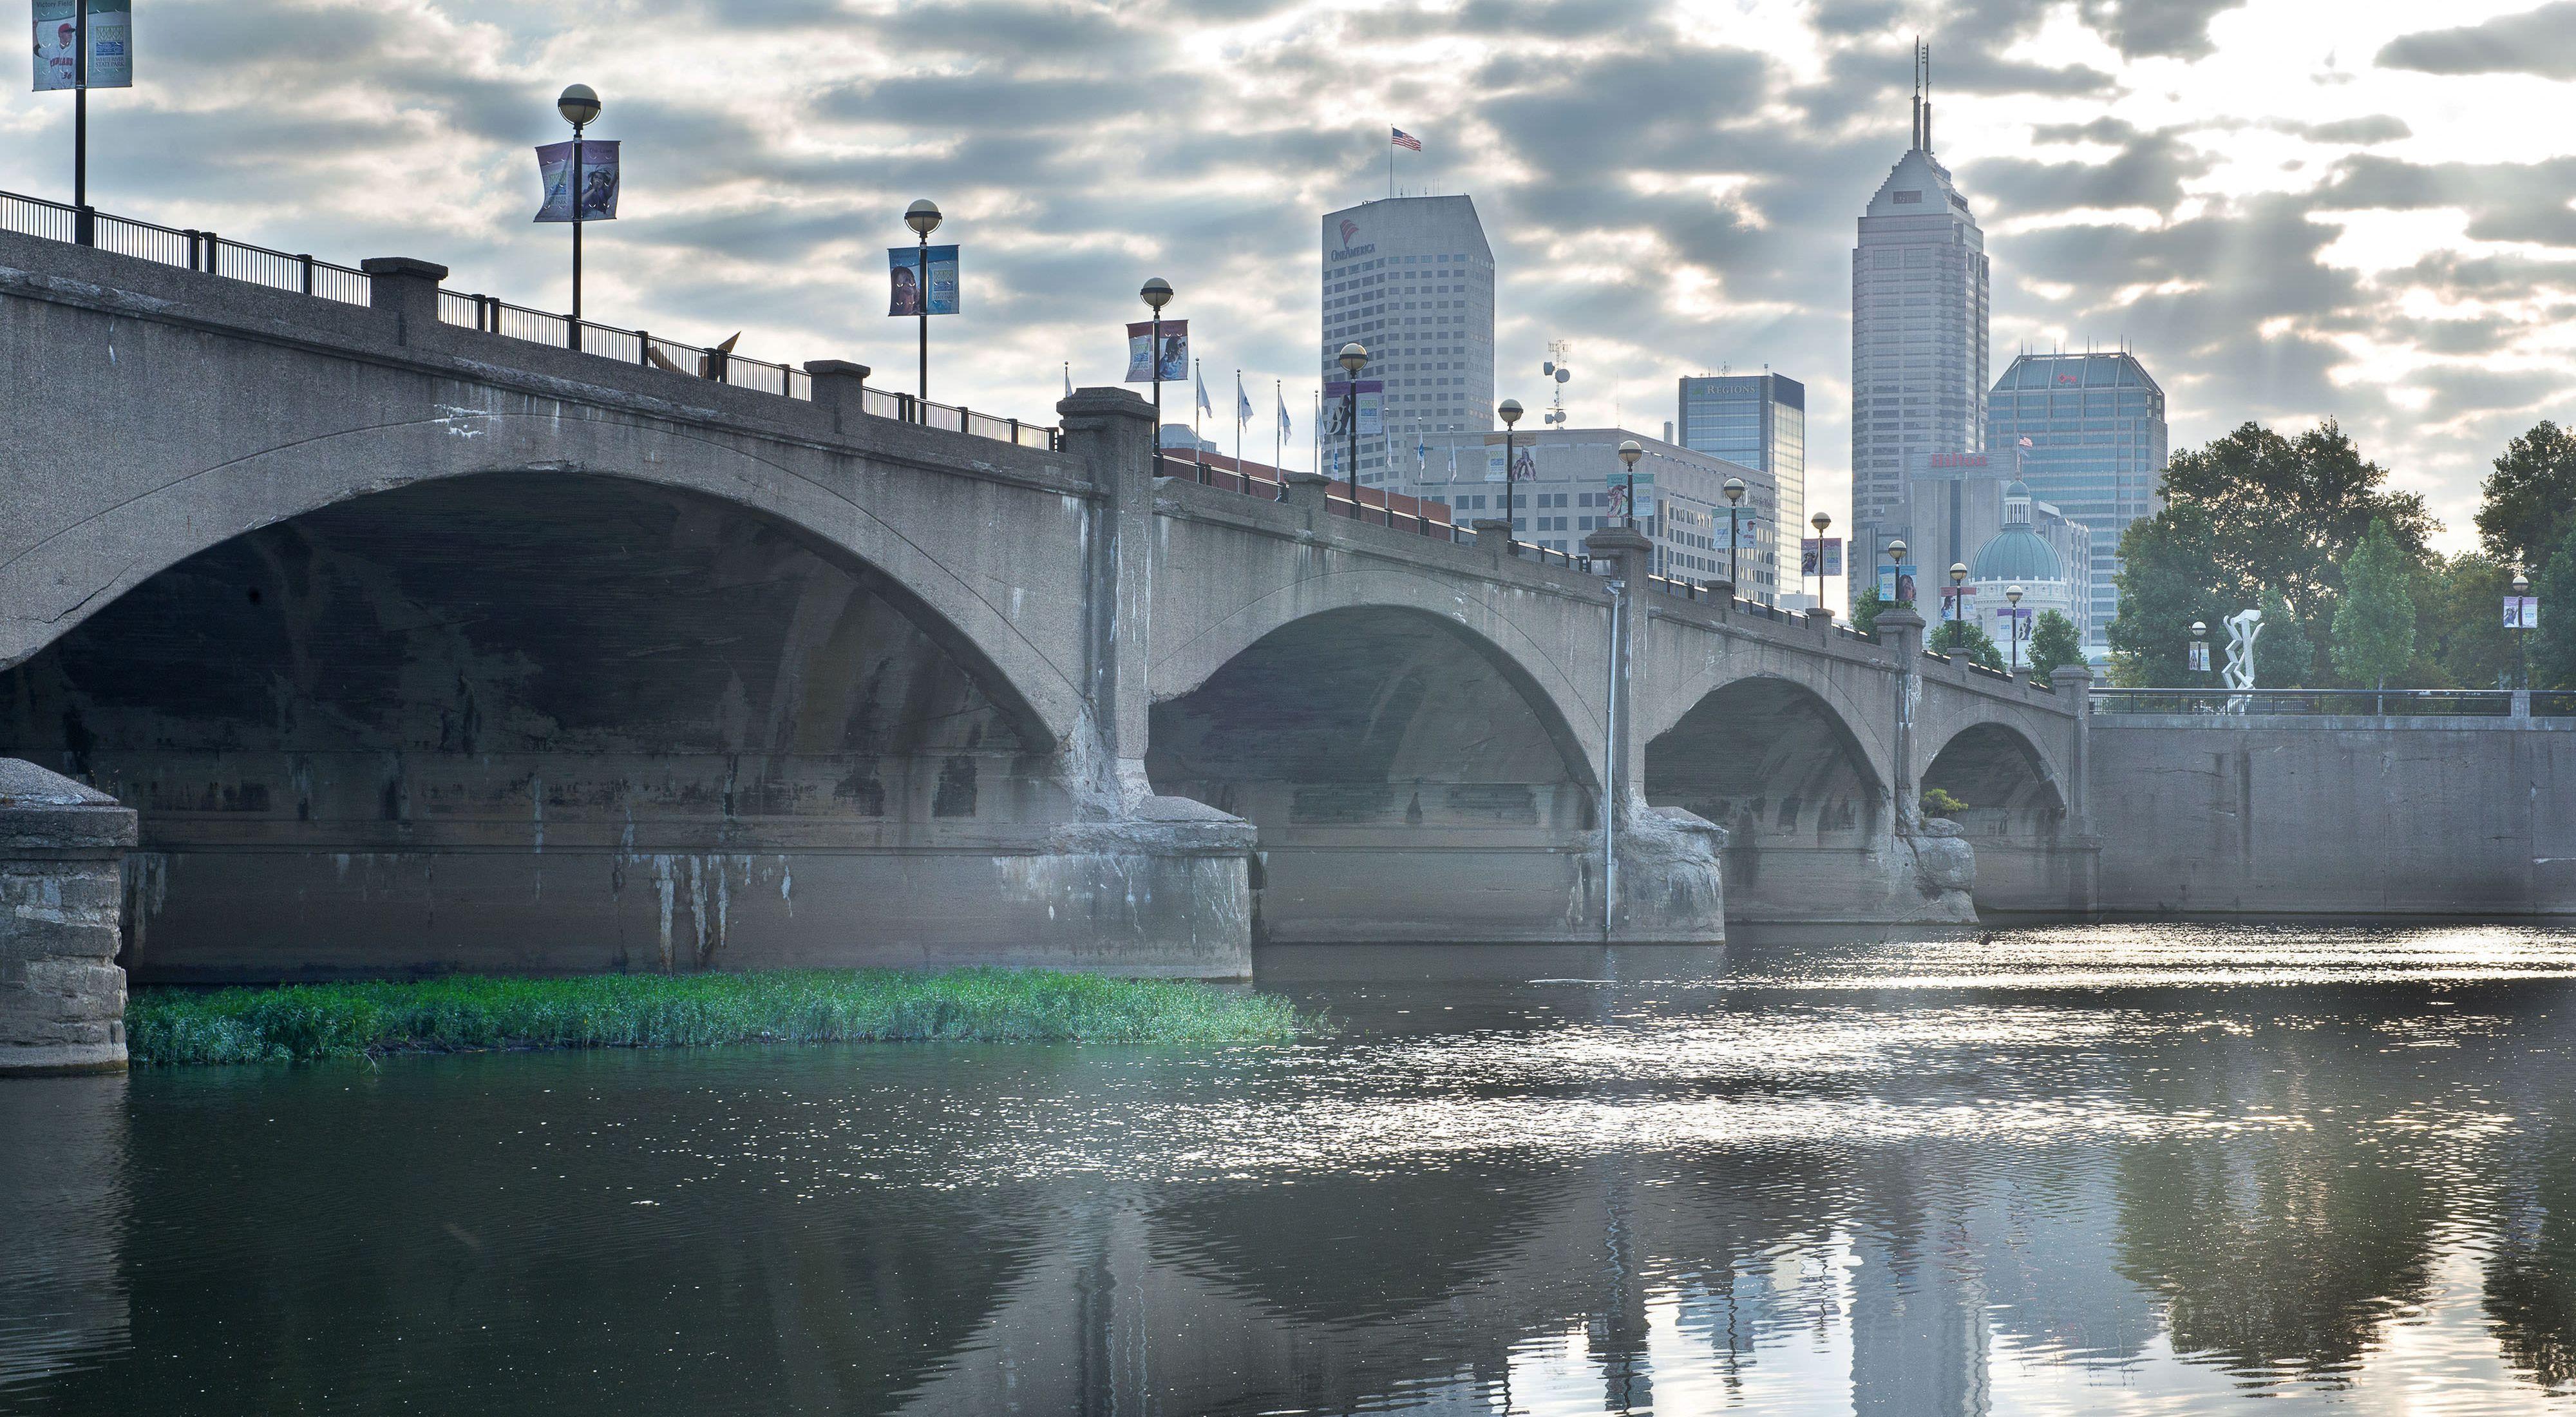 The White River as it flows through downtown Indianapolis